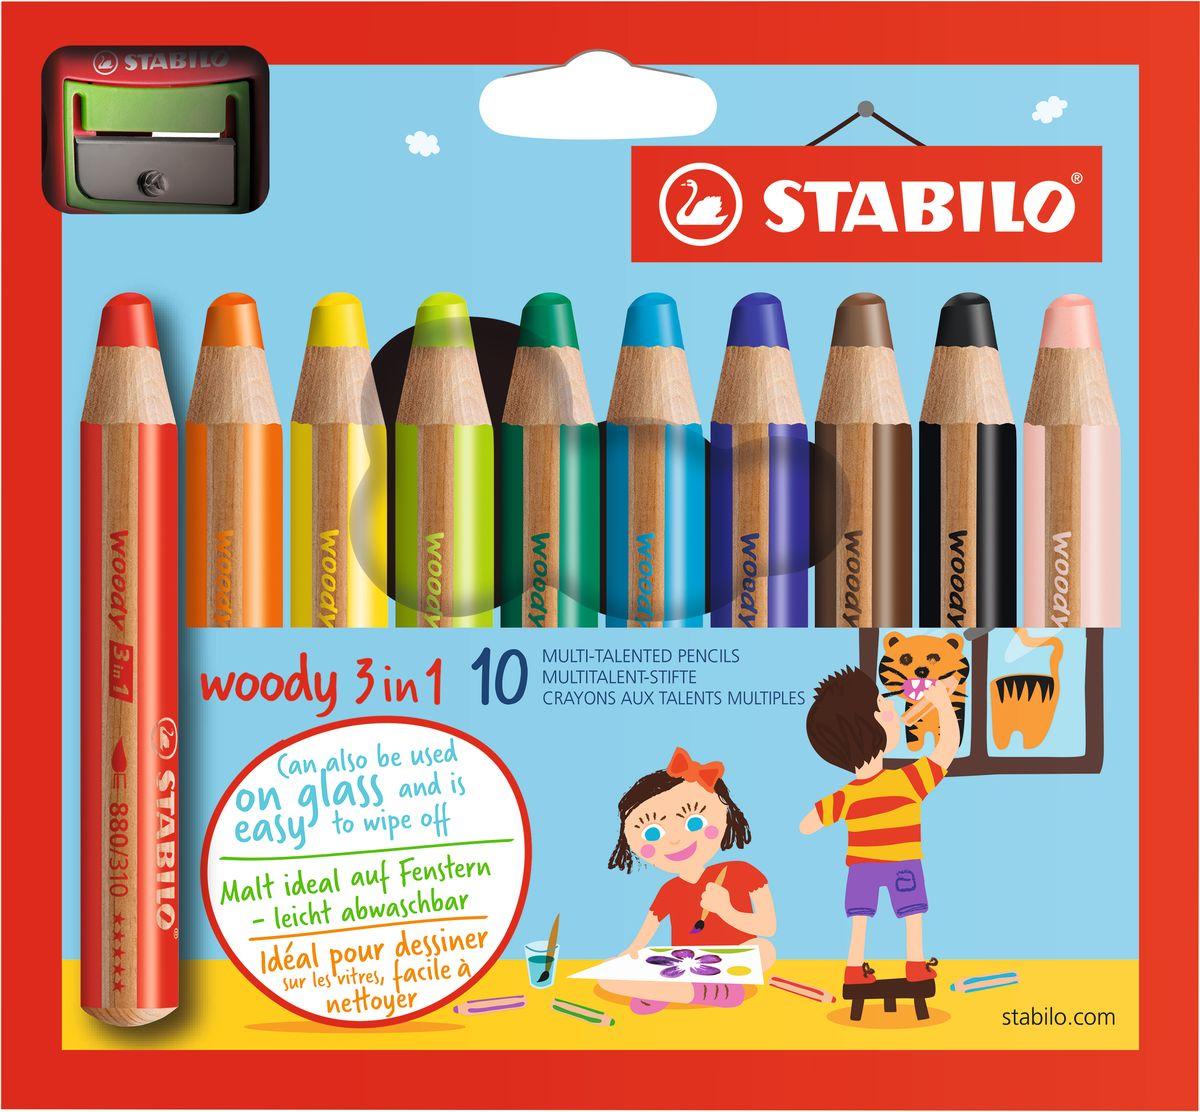 Stabilo Набор цветных карандашей Woody 3 in 1 10 цветов + точилка